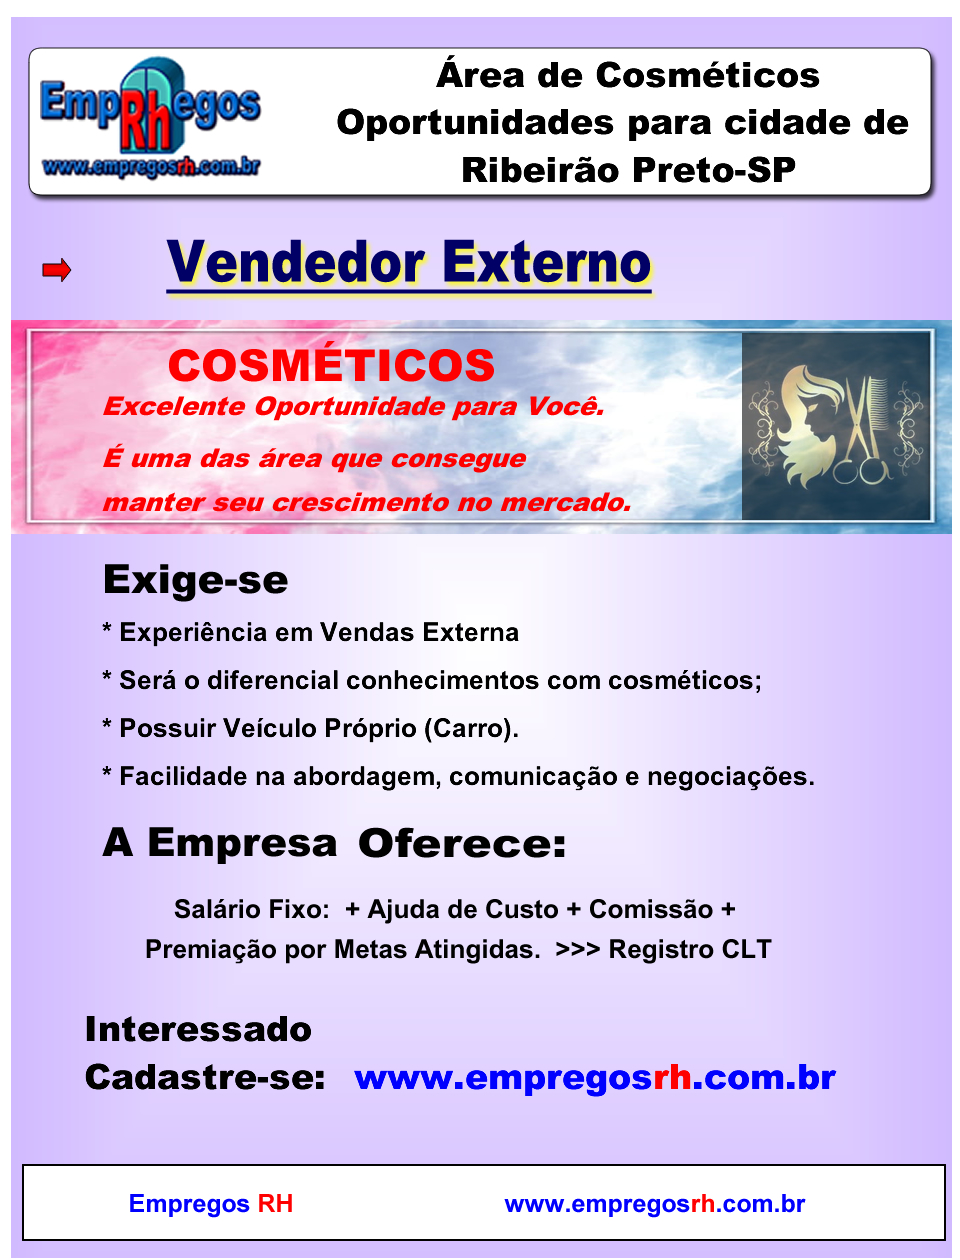 Vendedor(a) Externo(a) Cosméticos